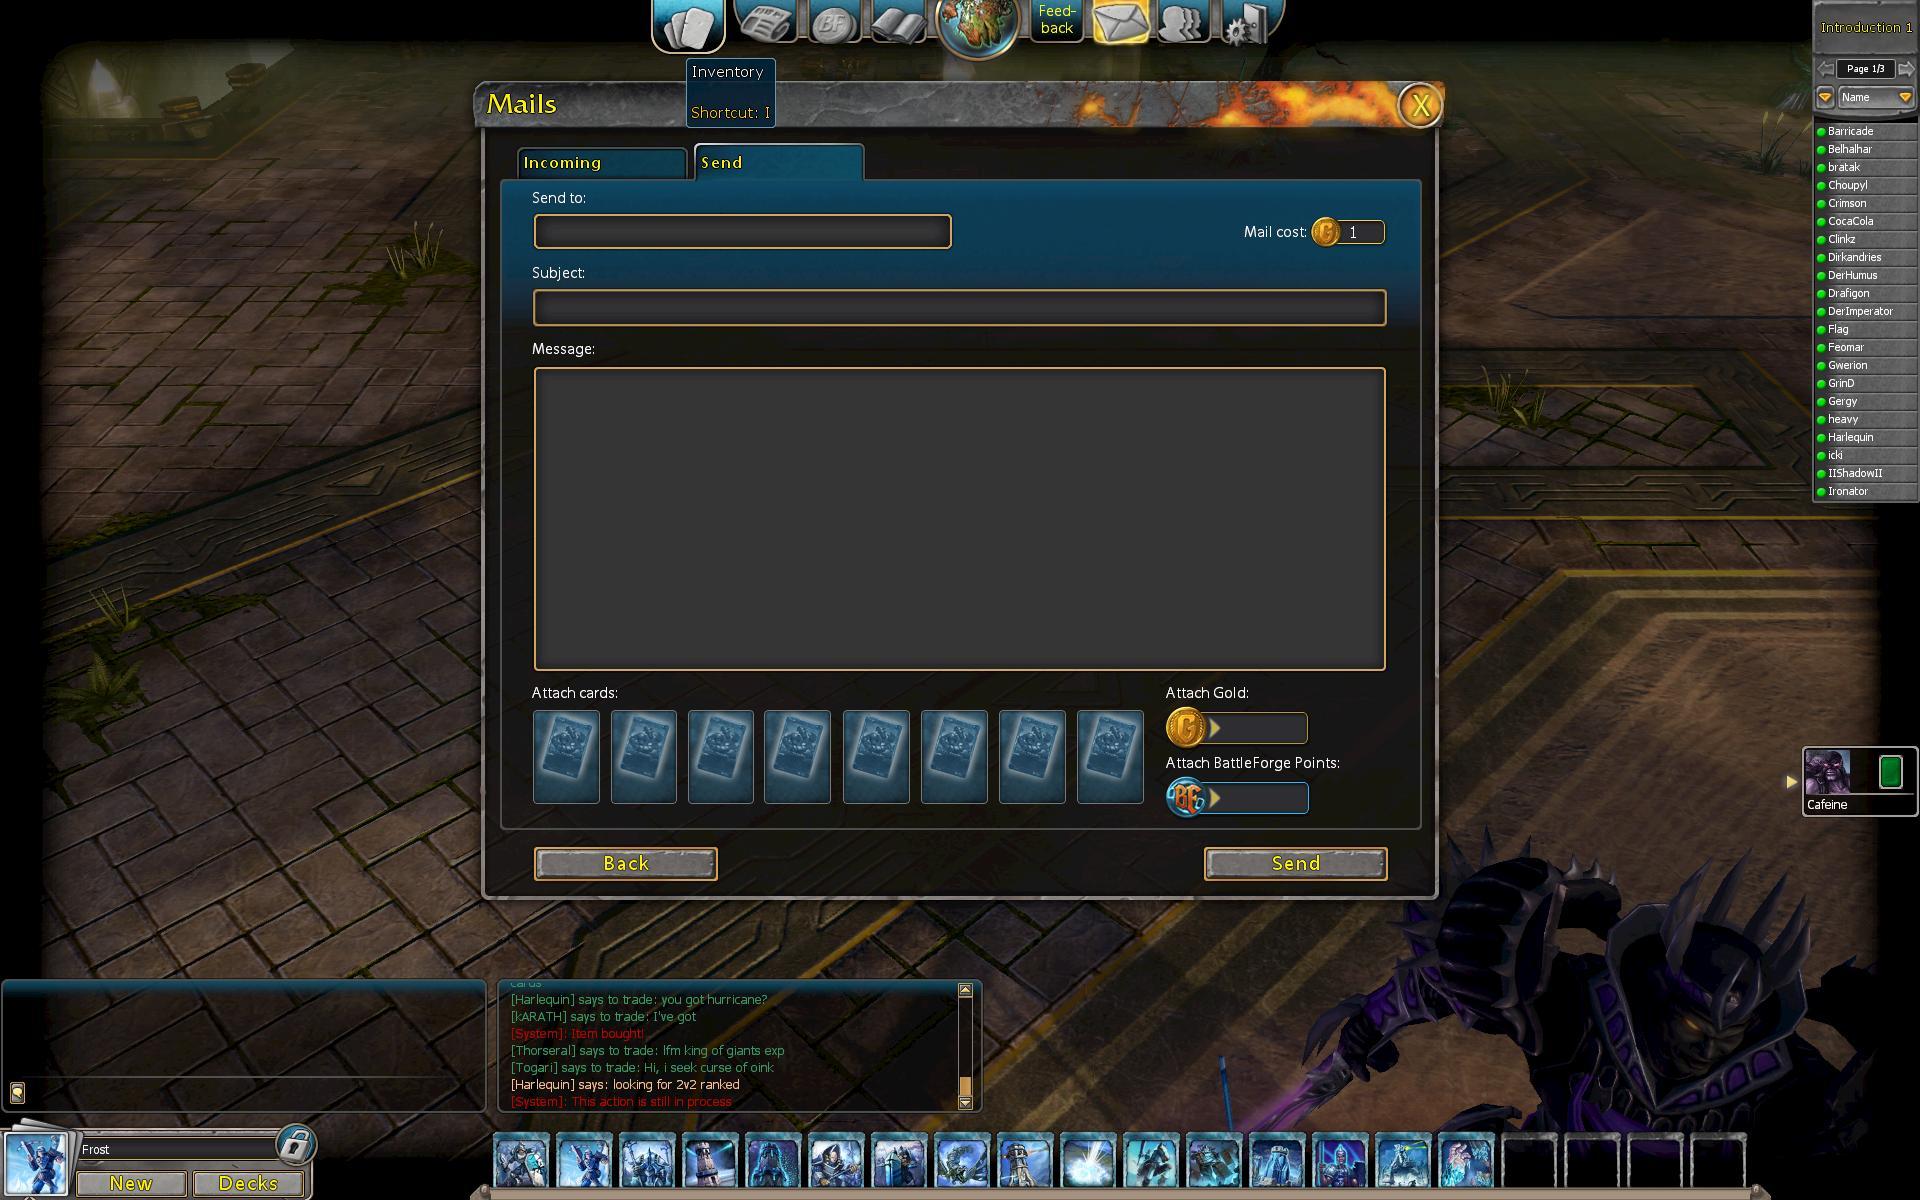 BattleForge PC Preview 05